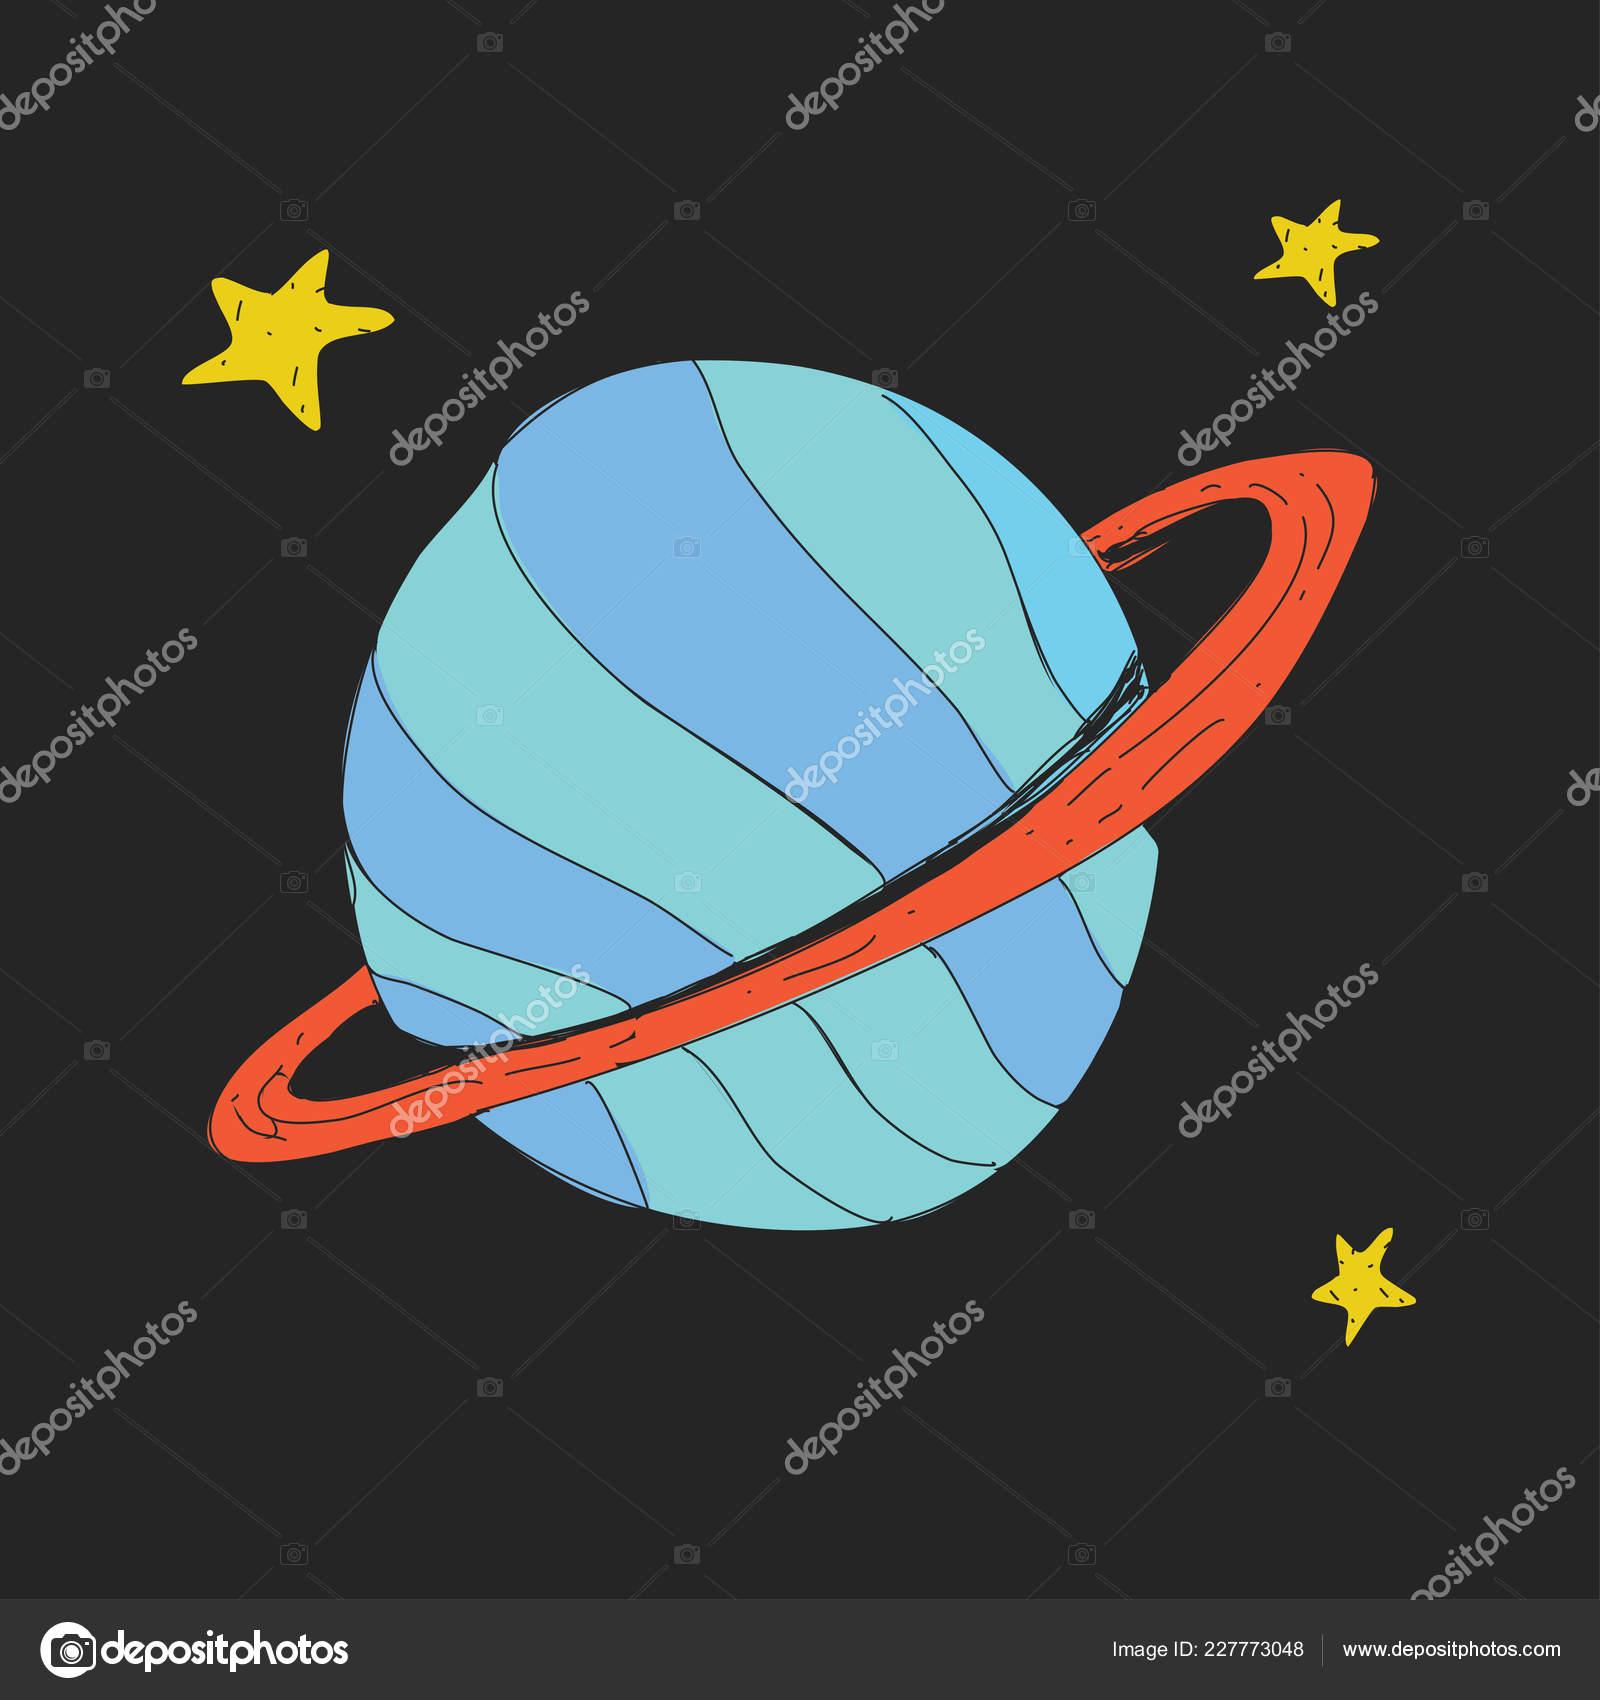 Icone De La Planete Du Dessin Anime Saturne Geante Gazeuse Et